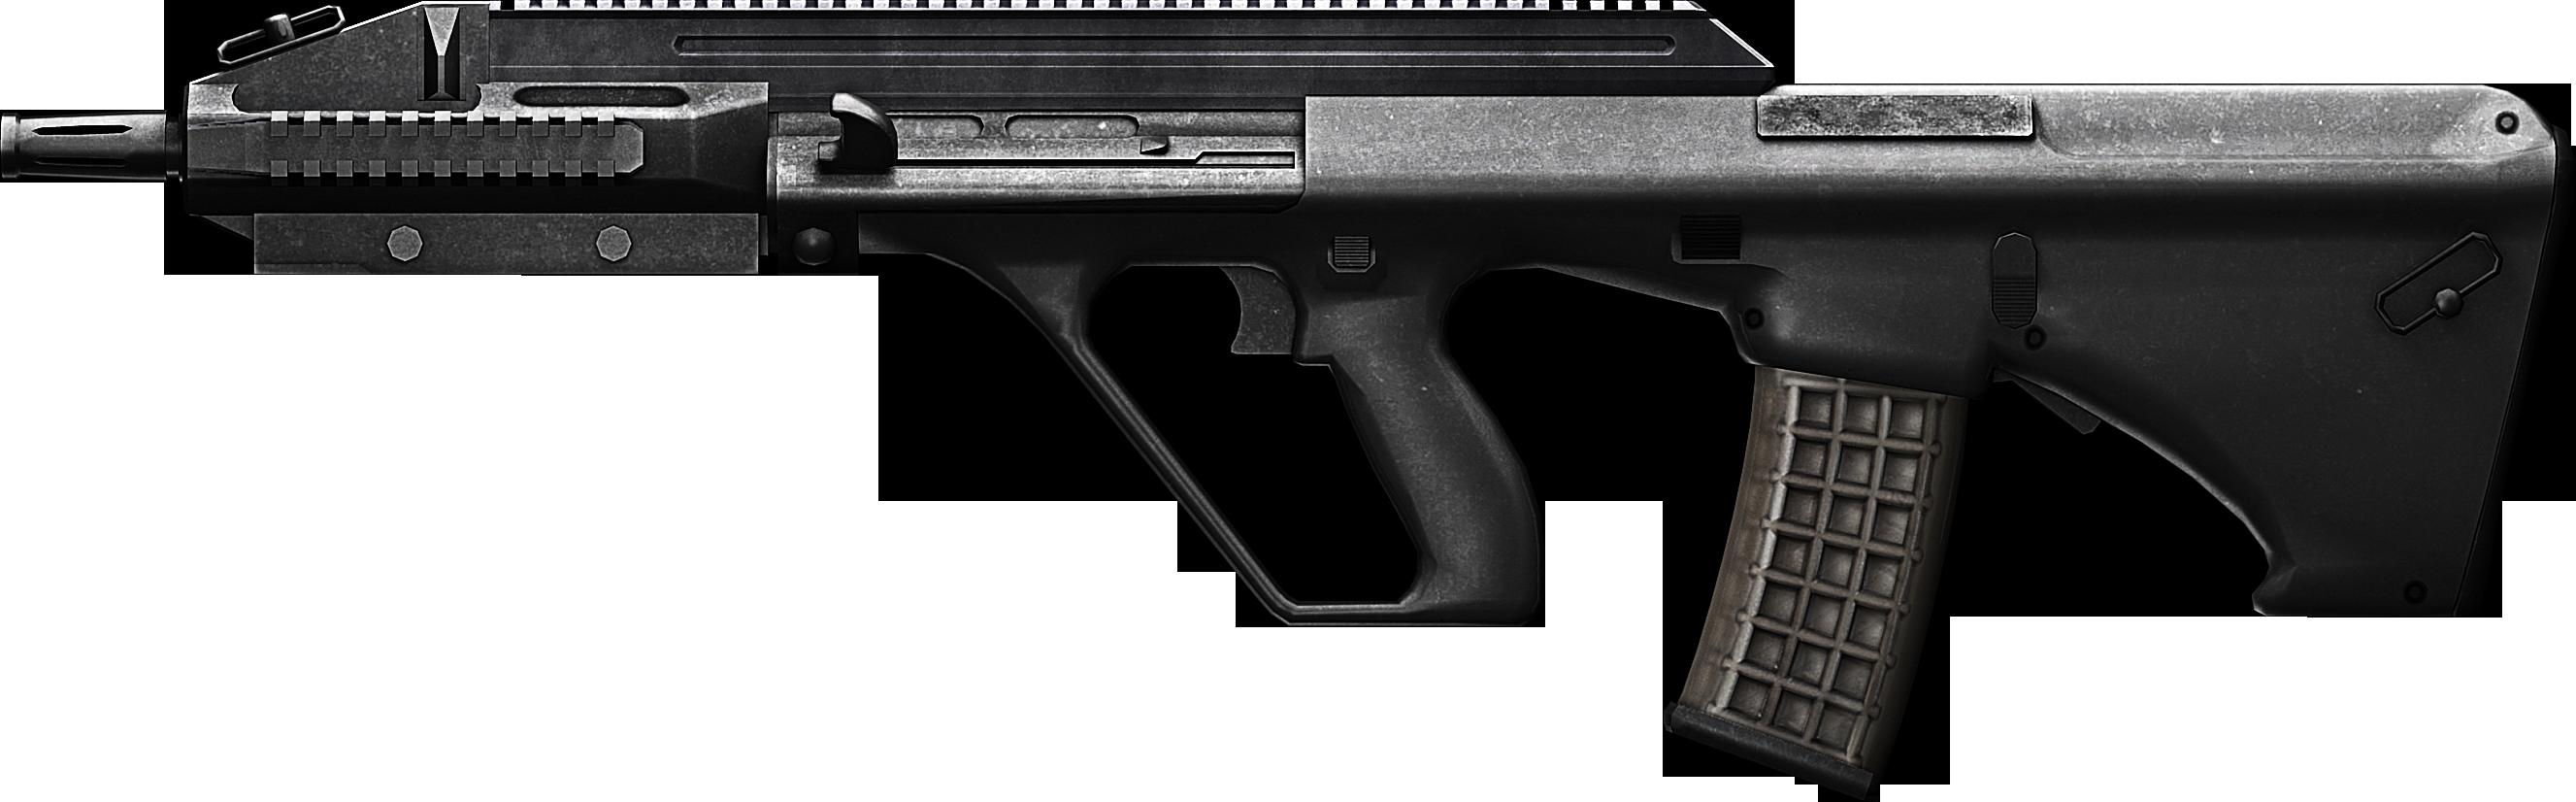 Metal Assault Rifle NEw PNG Image